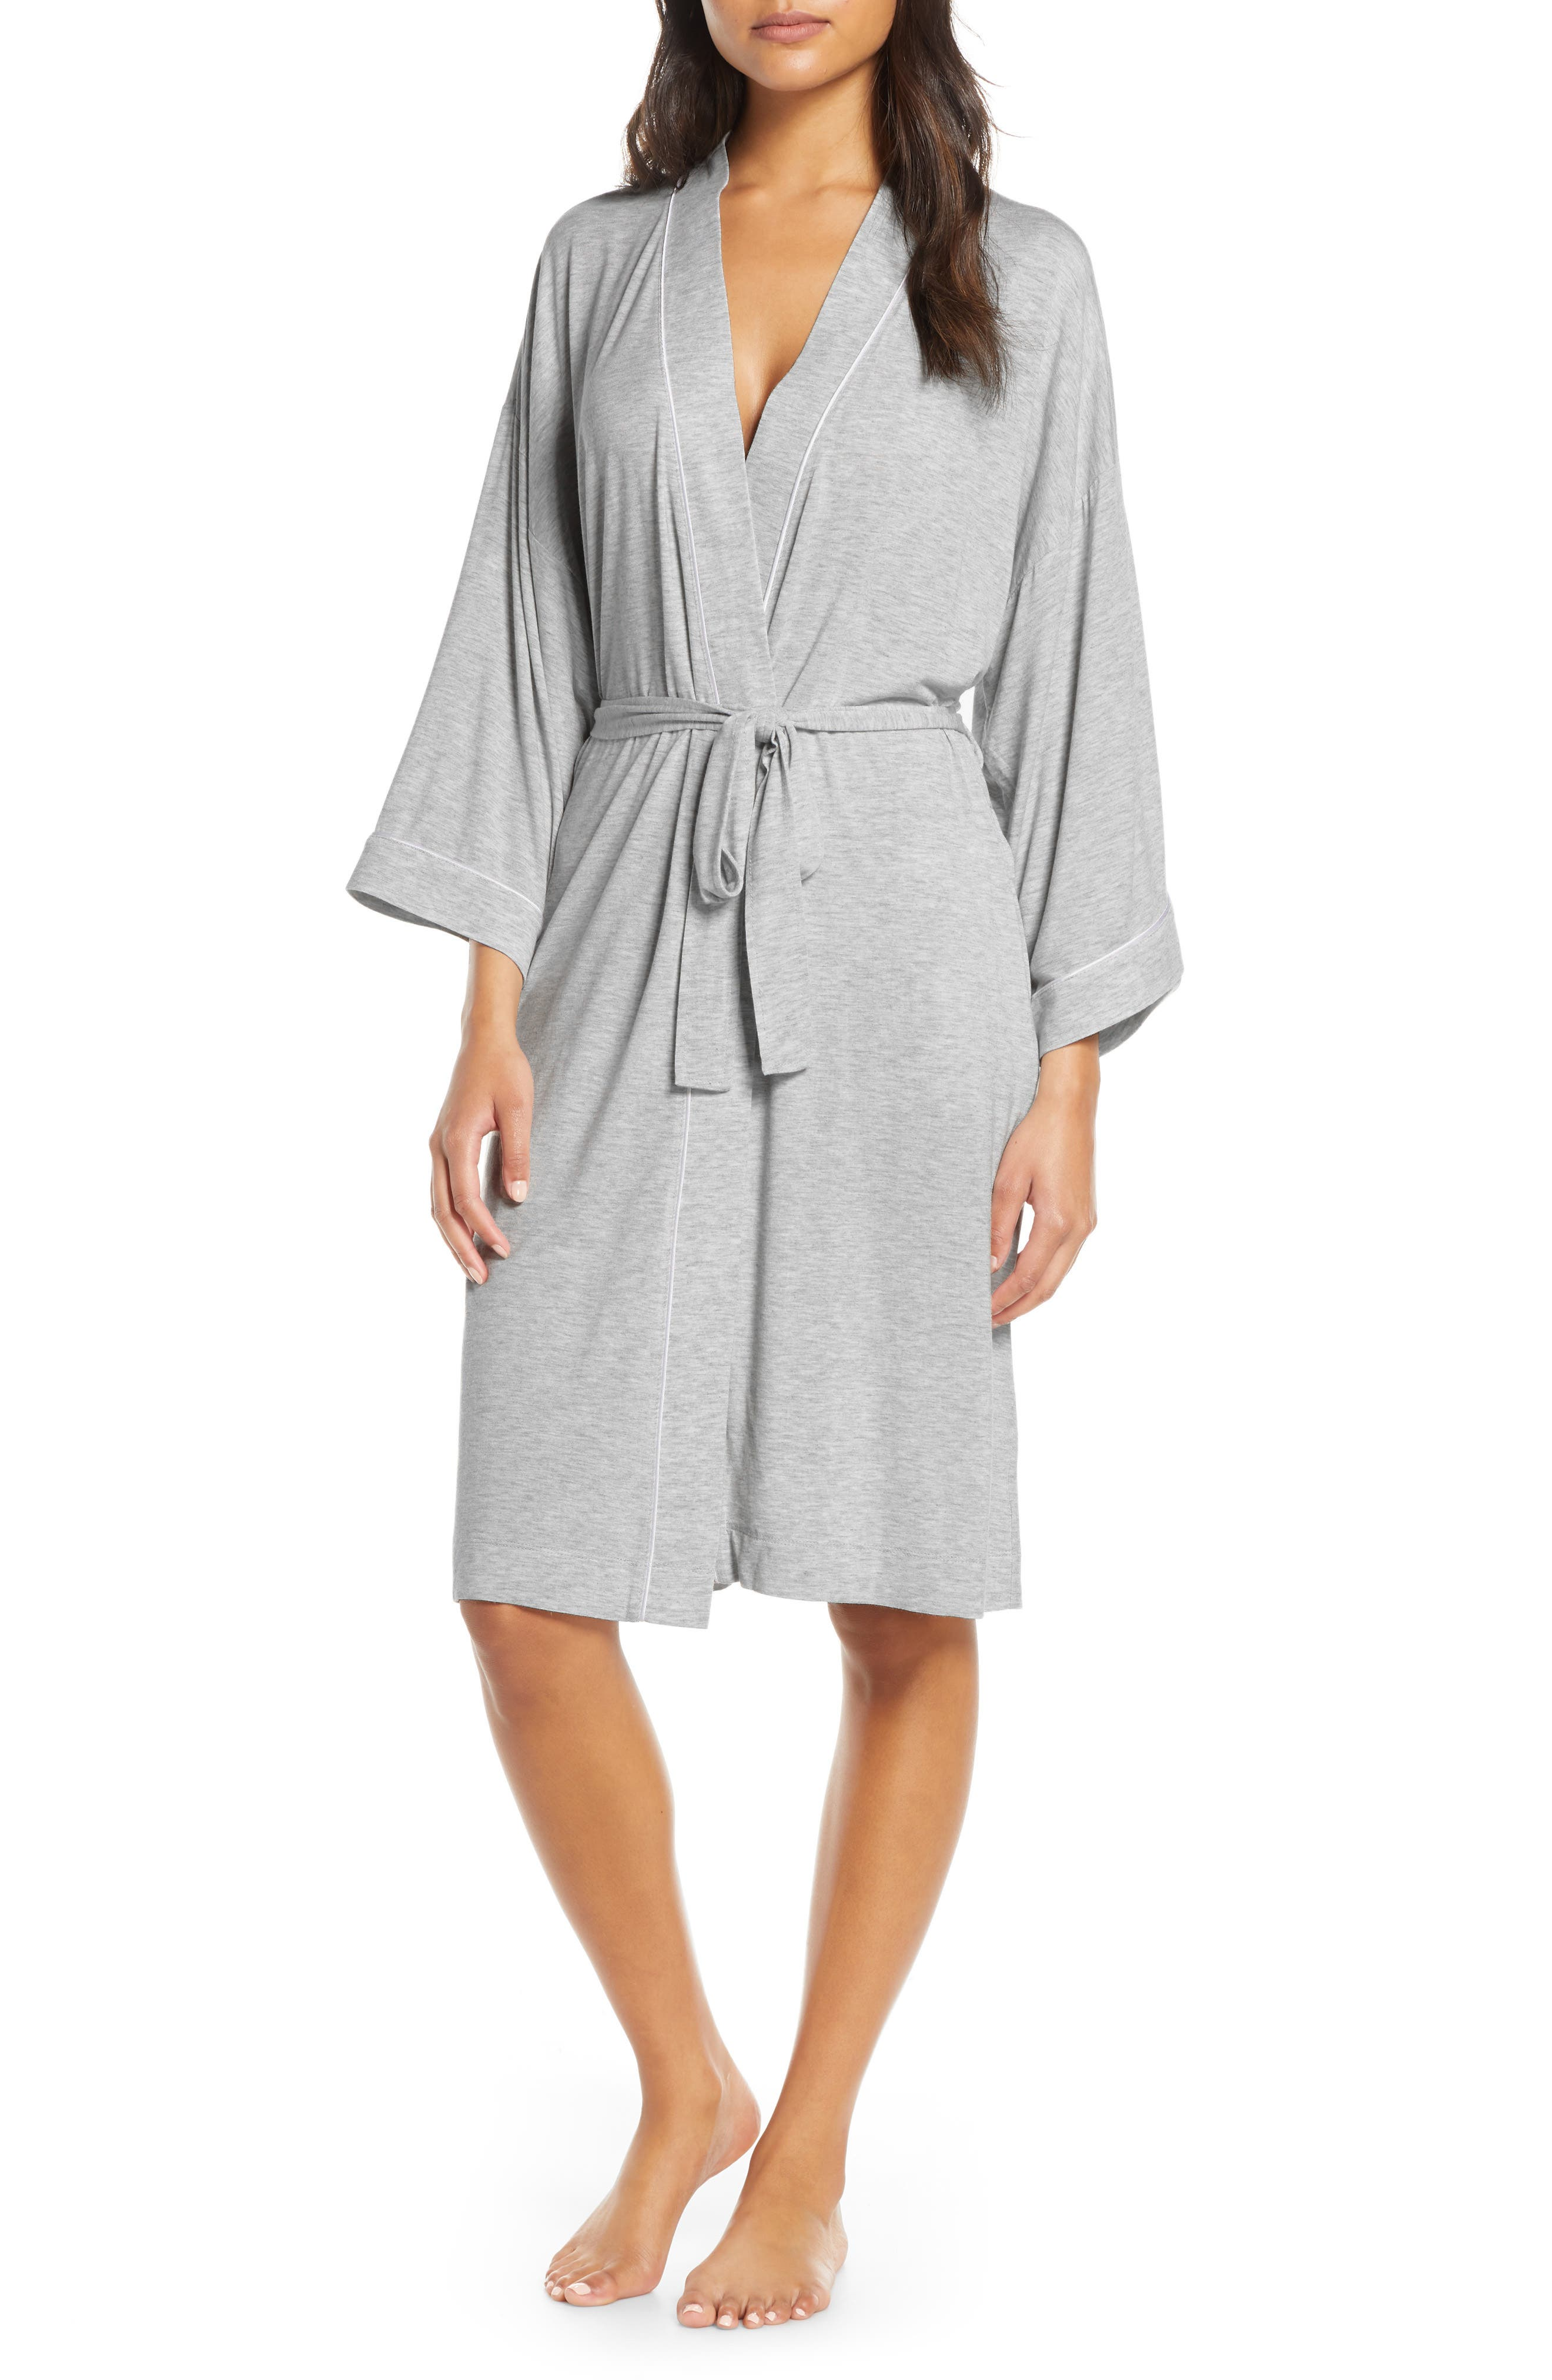 Nordstrom Lingerie Moonlight Jersey Robe